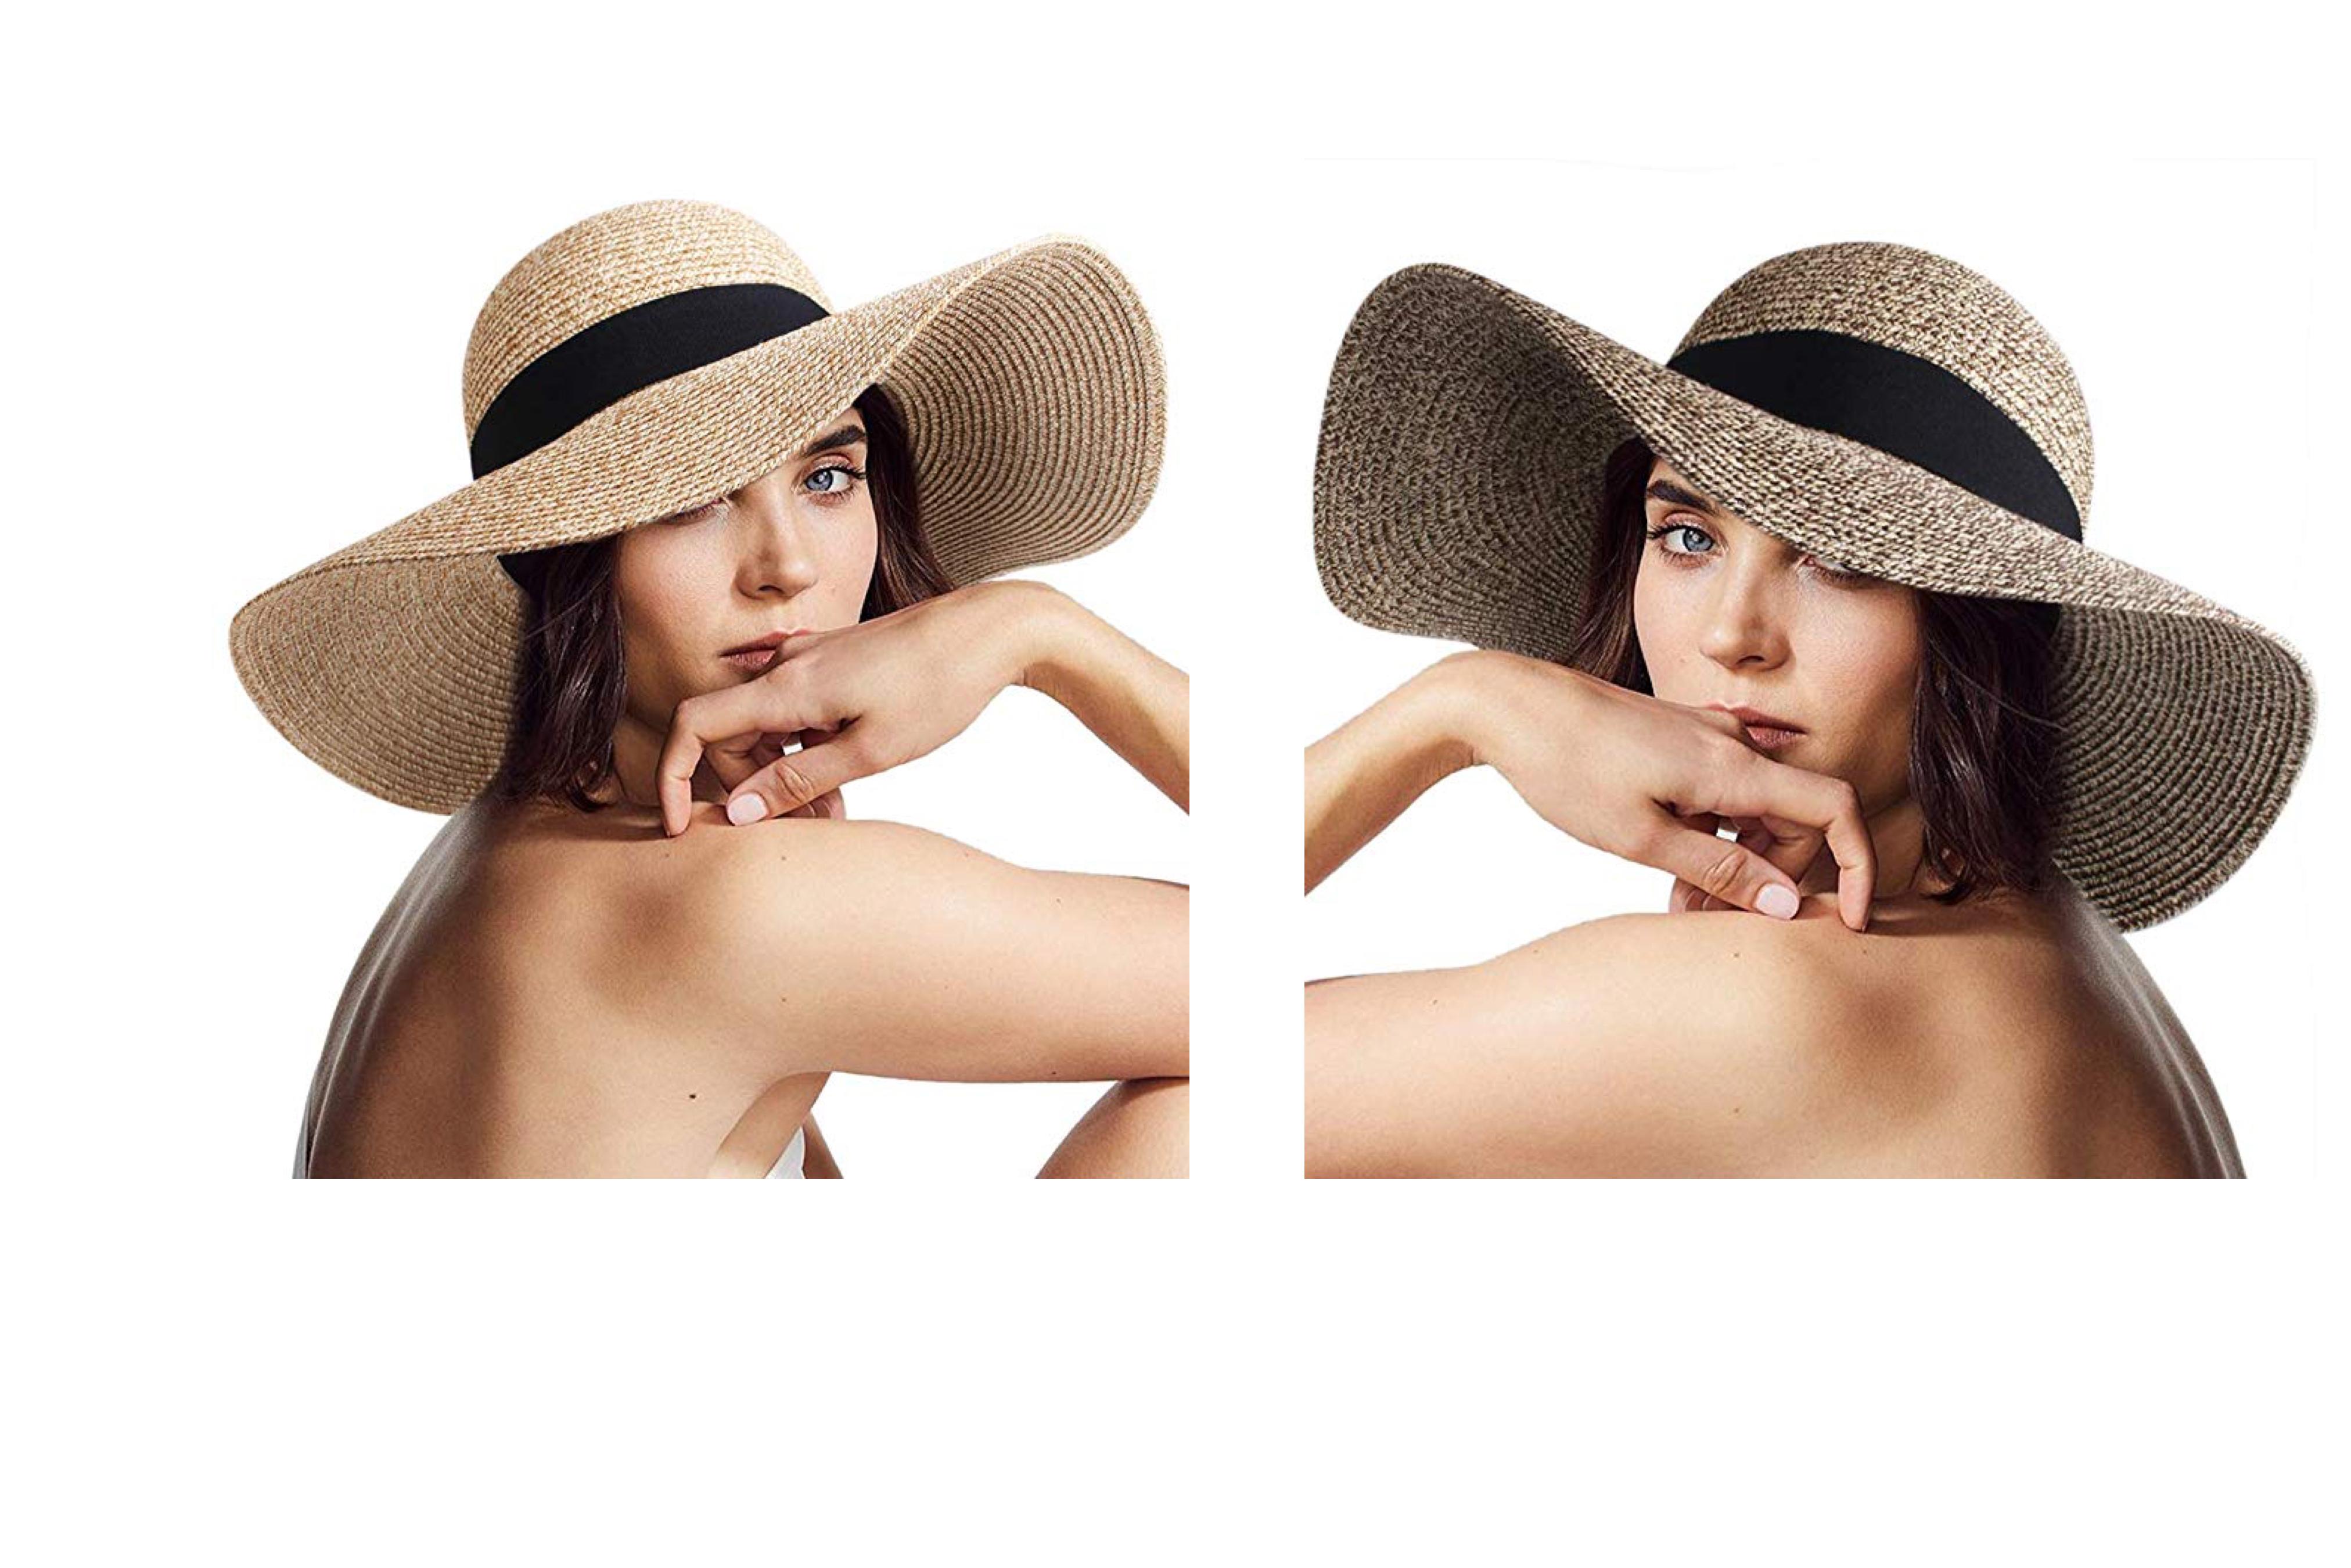 The Furtalk Women's Foldable Straw Hat